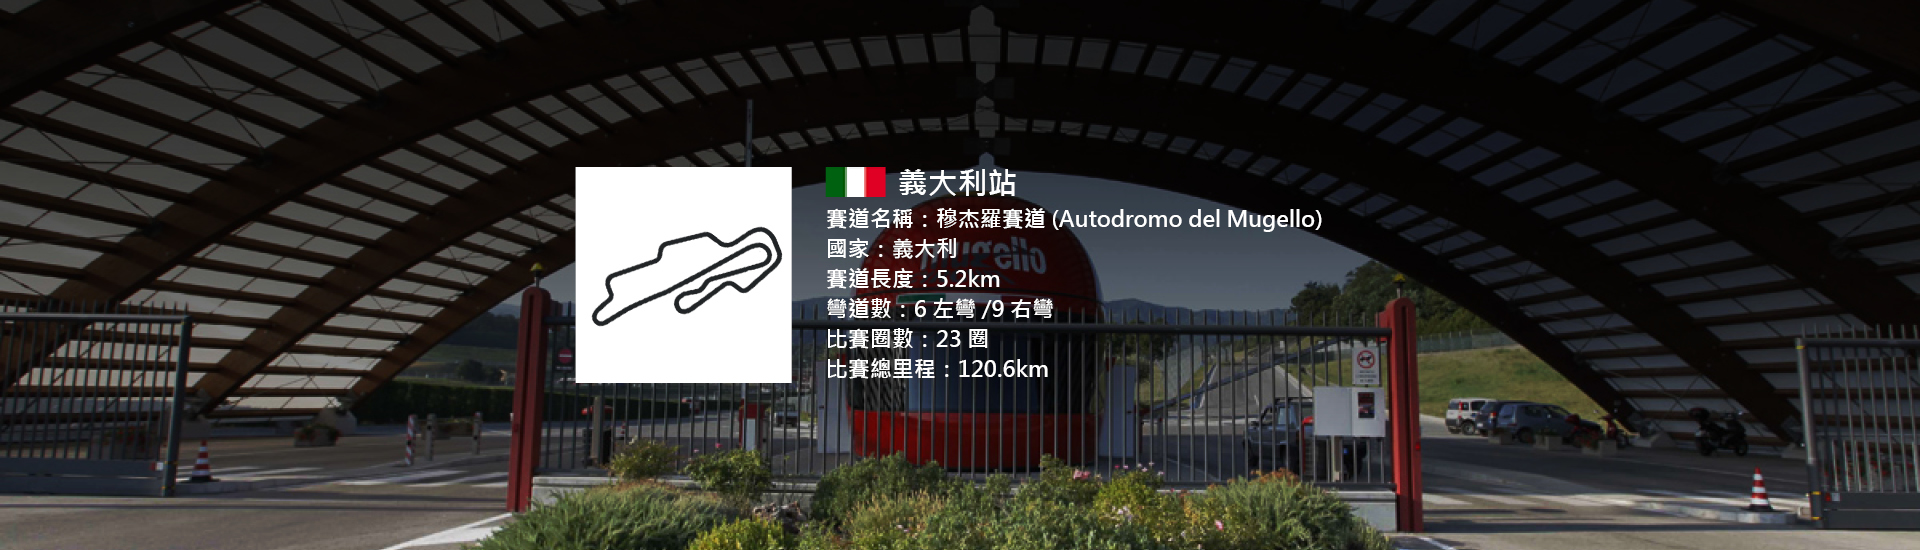 2018 MotoGP 義大利站